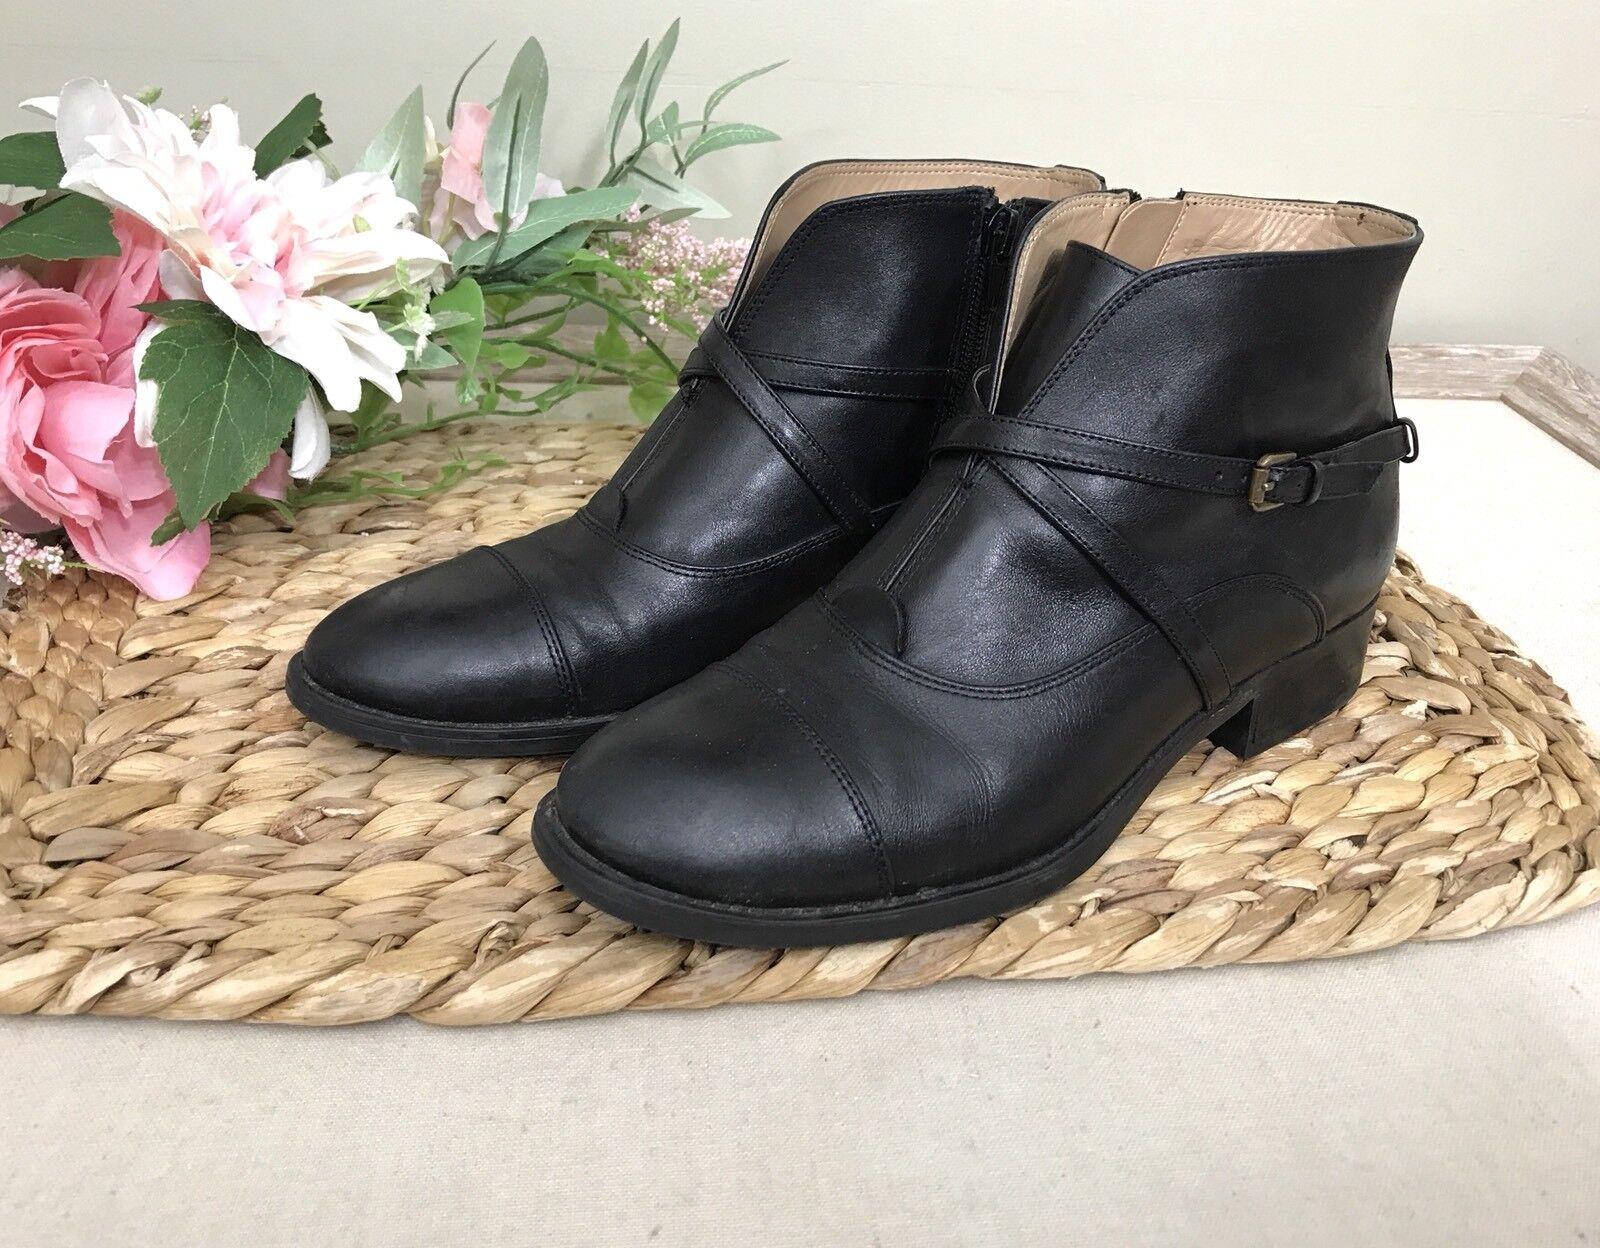 Isaac Mizrahi New York sz 8 Black Leather Ankle Boots Strap Detail Zipper